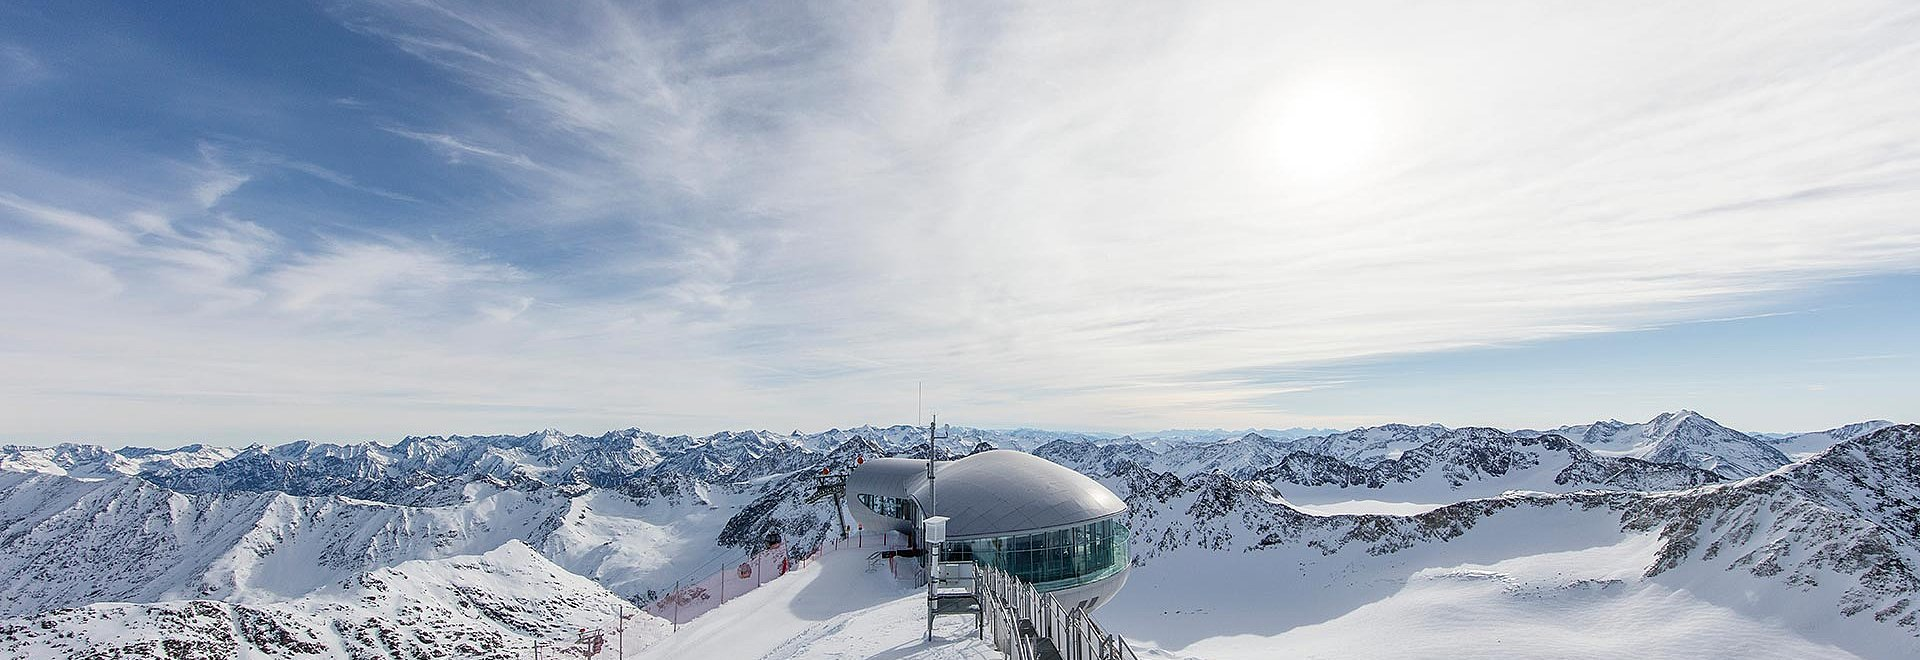 Restaurant am Pitztaler Gletscher